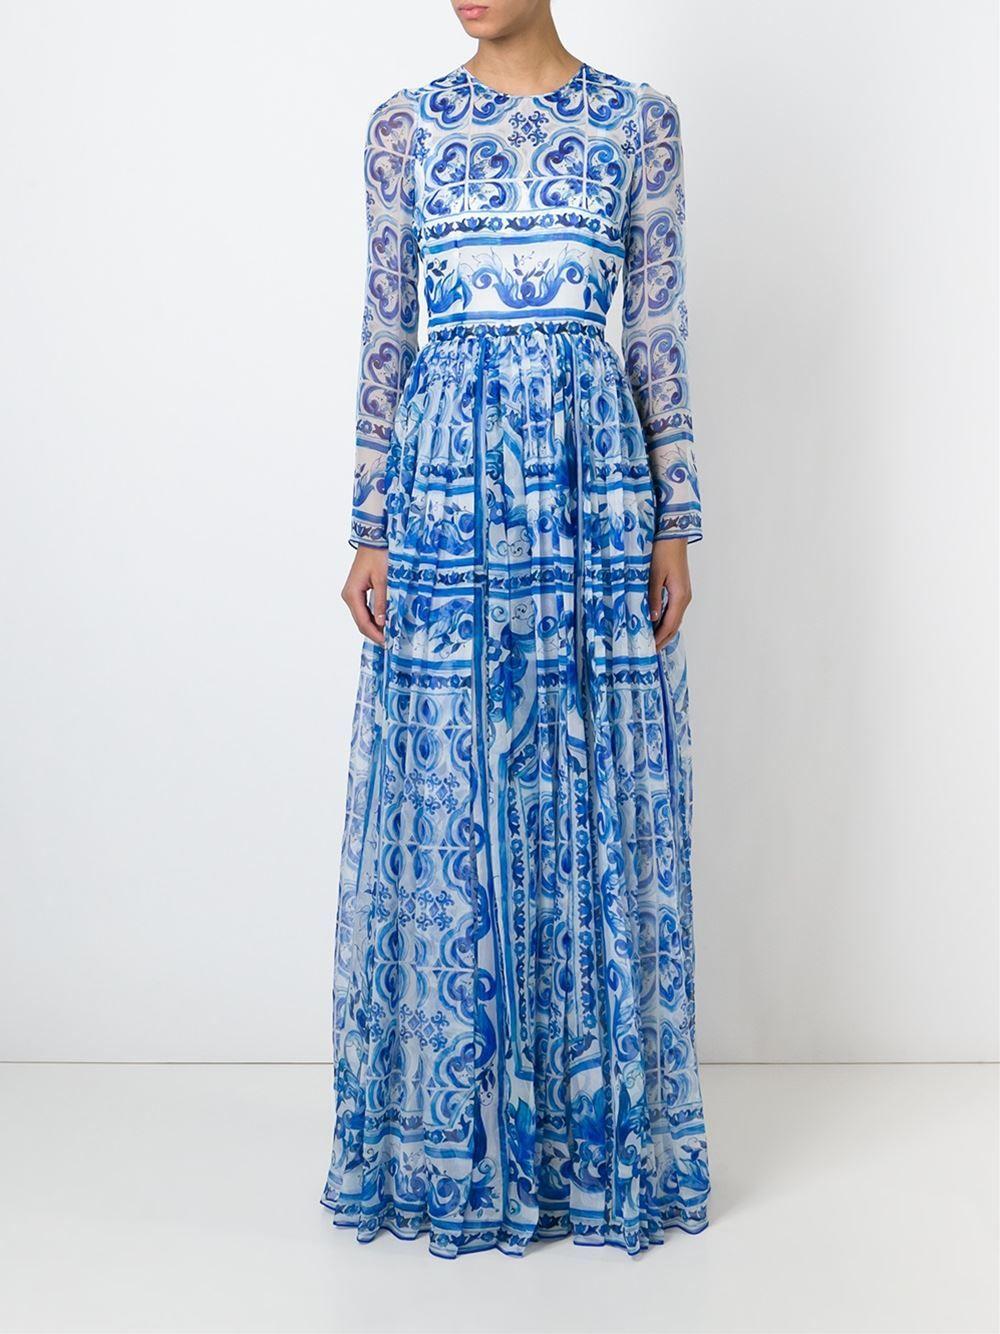 764db030dfa3b3 Dolce & Gabbana 'majolica' Maxi Dress - Donne Concept Store - Farfetch.com